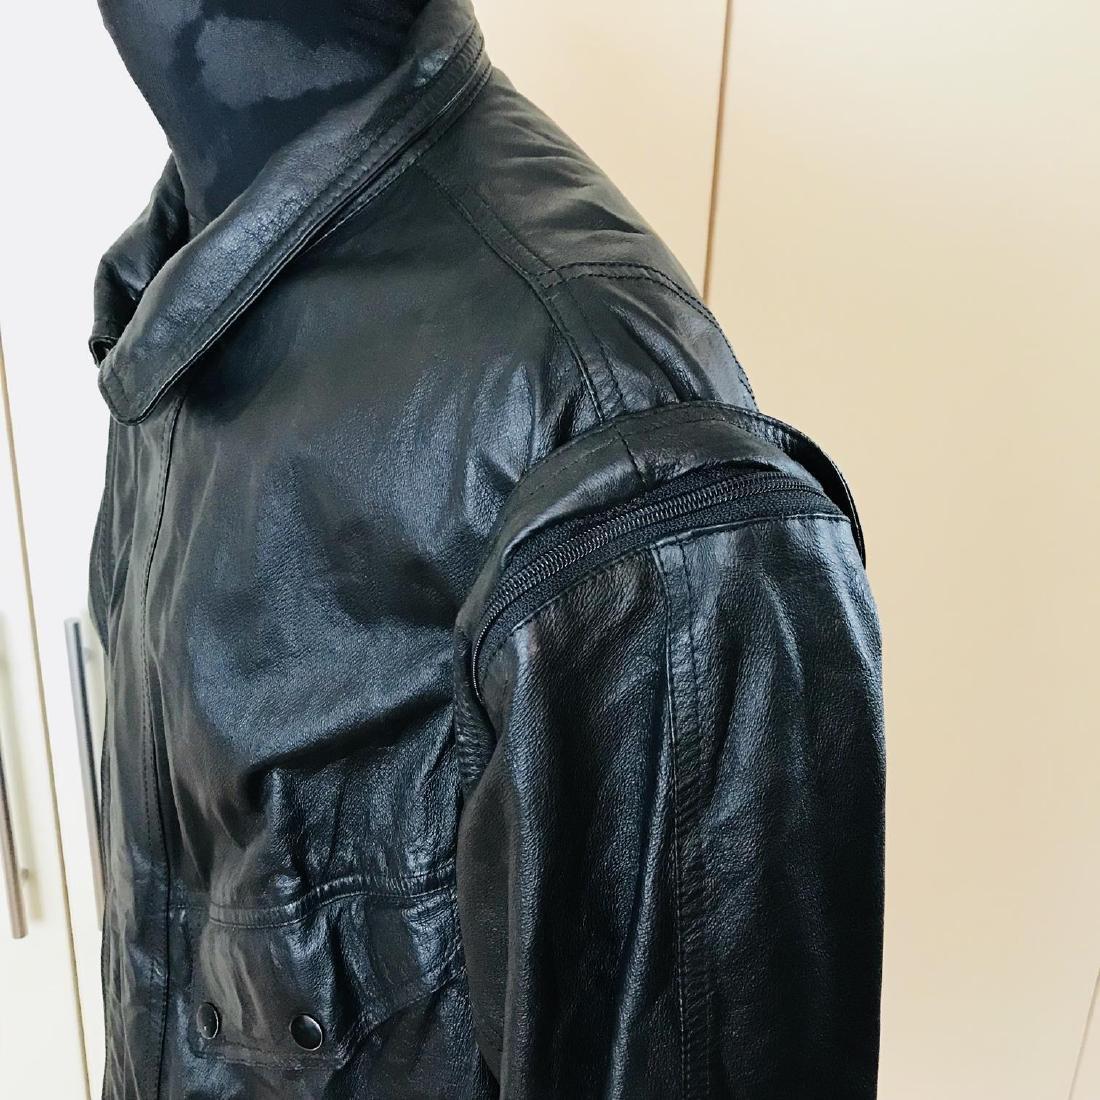 Vintage Men's Boecker Leather Jacket Size US 42 - 4